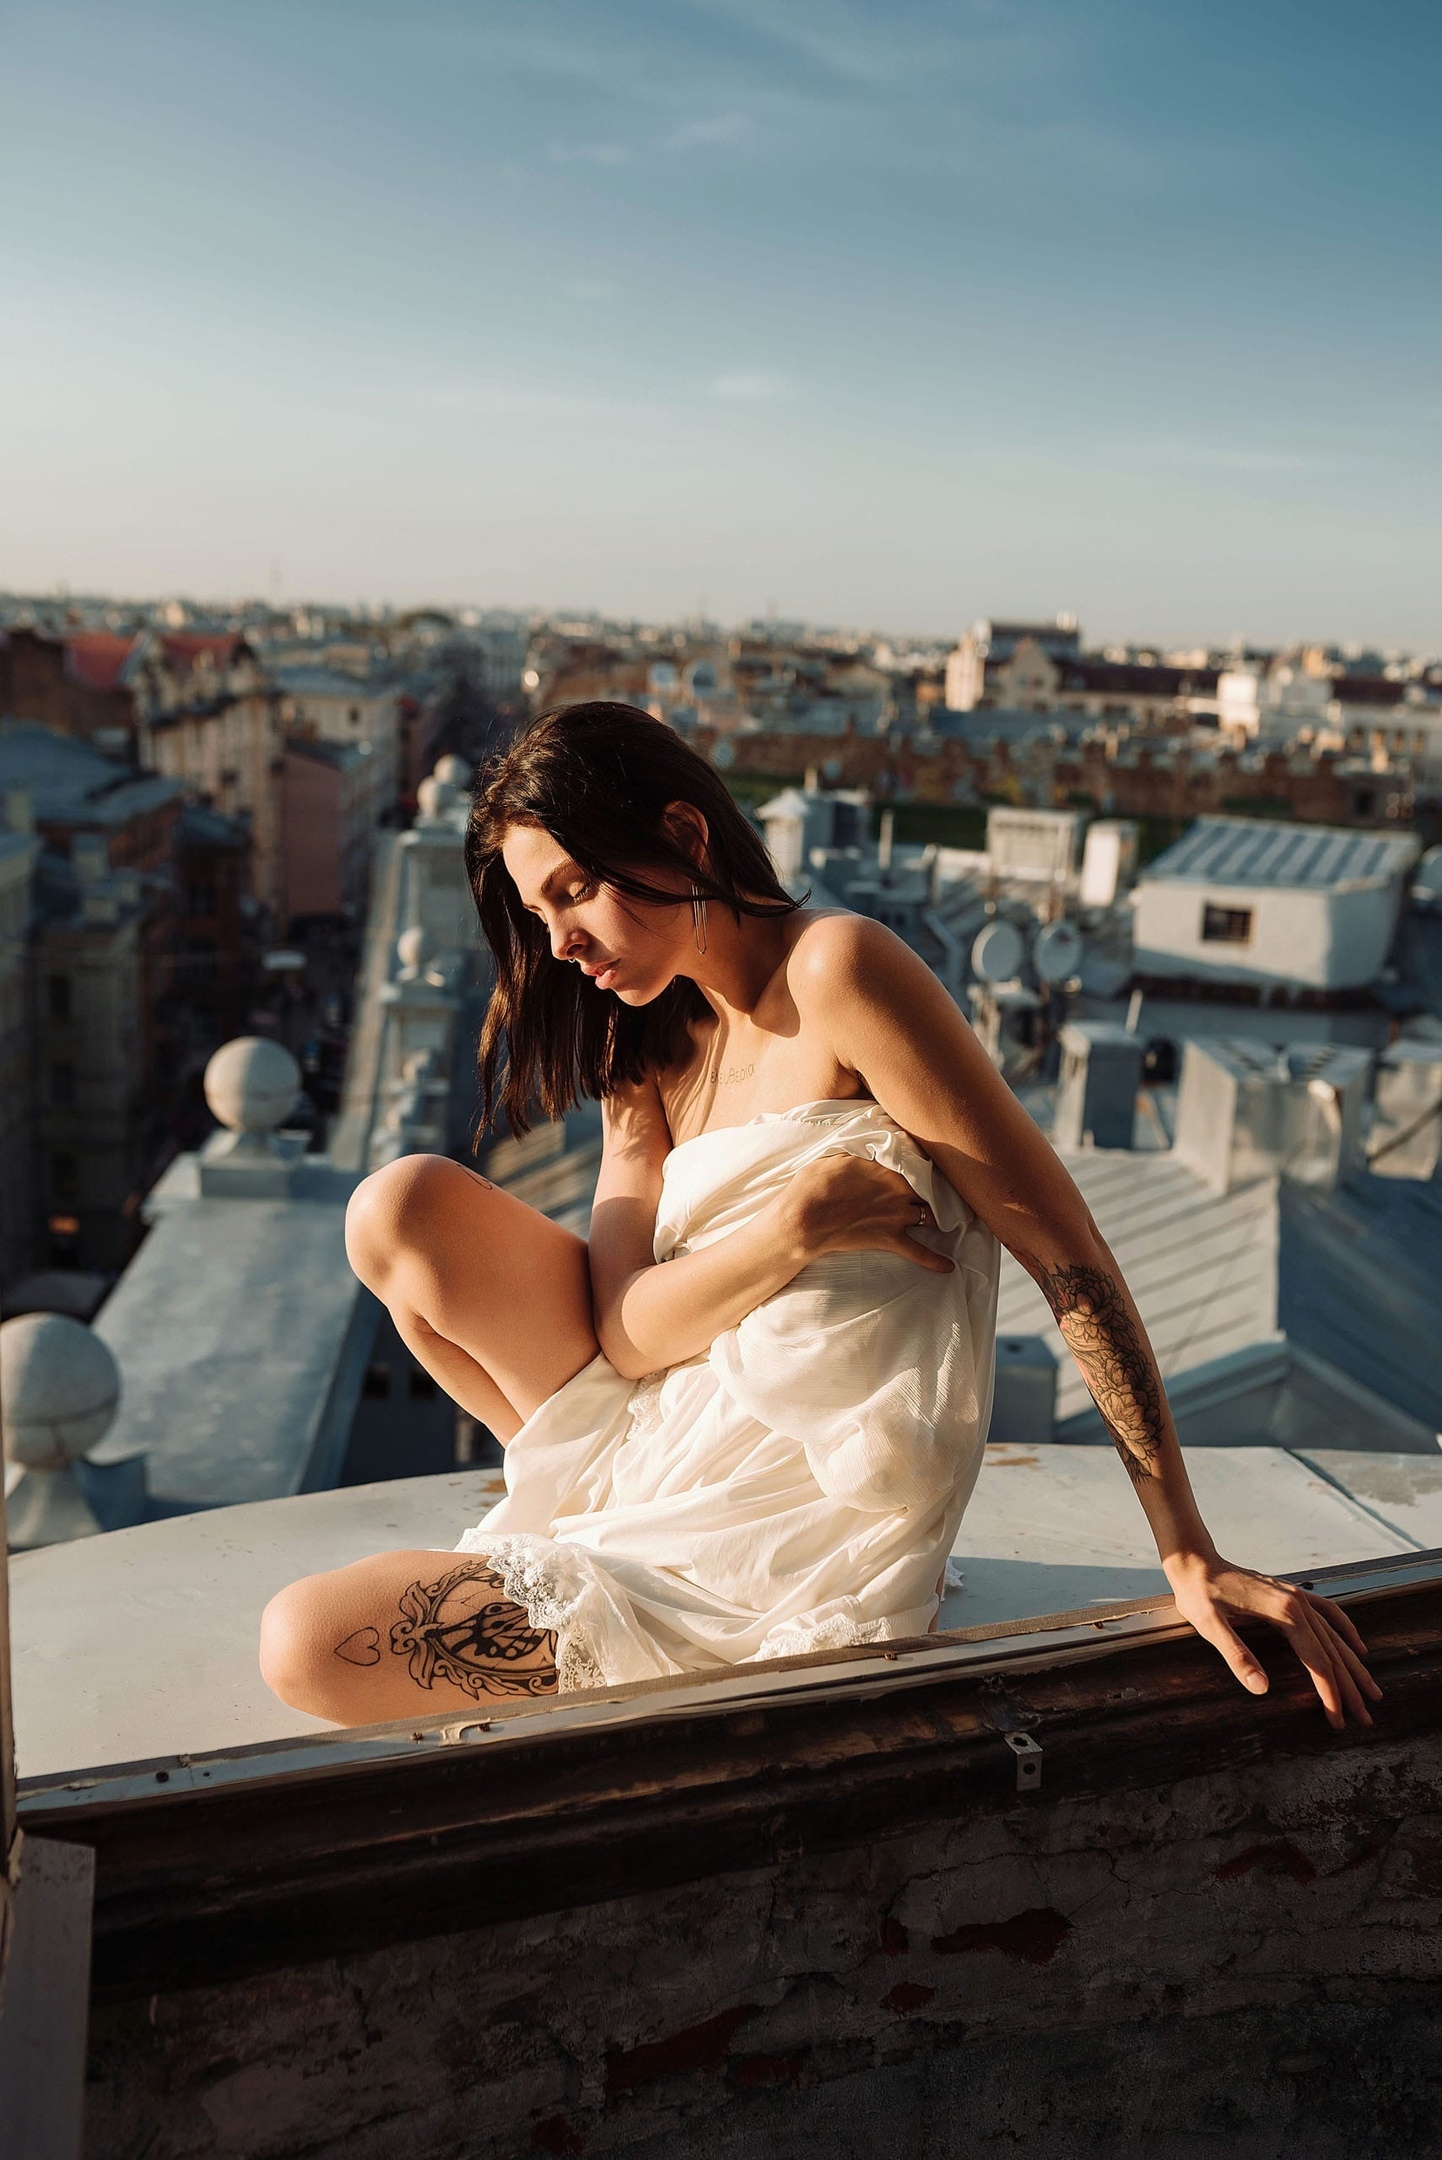 https://www.youngfolks.ru/pub/photographer-timur-razyapov-113107